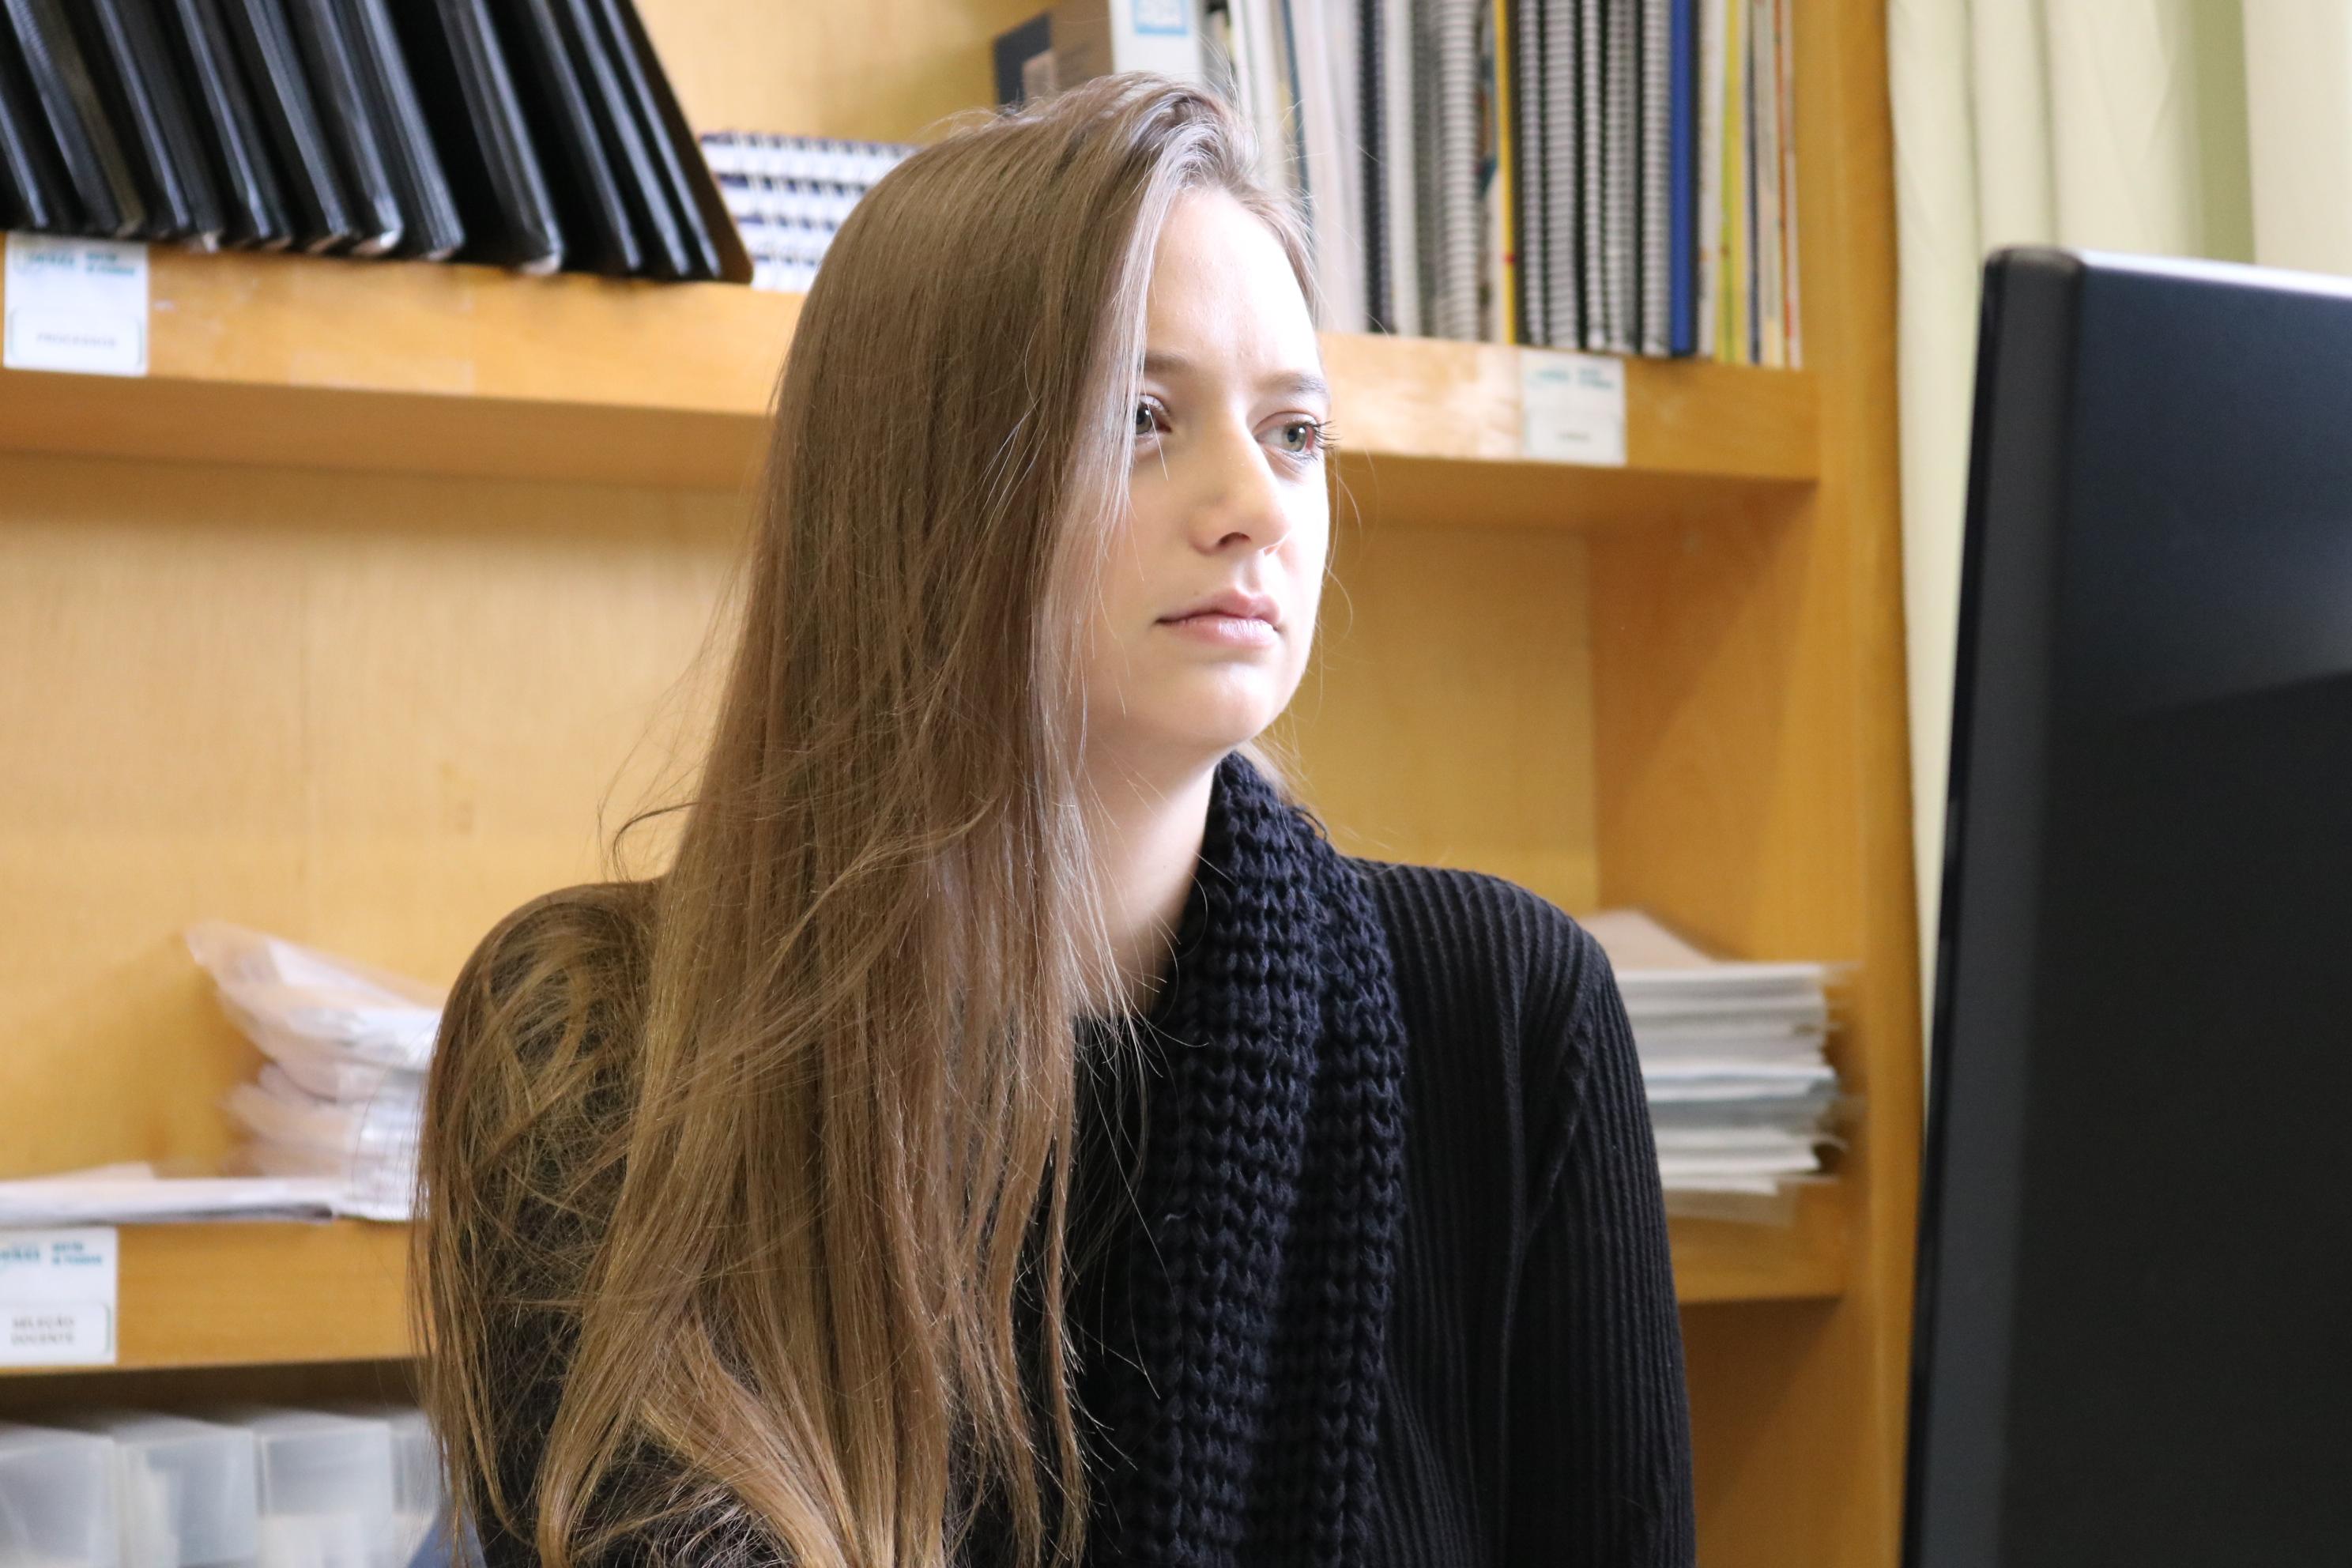 Elen-hobuss-aluna-ucpel-psicologia